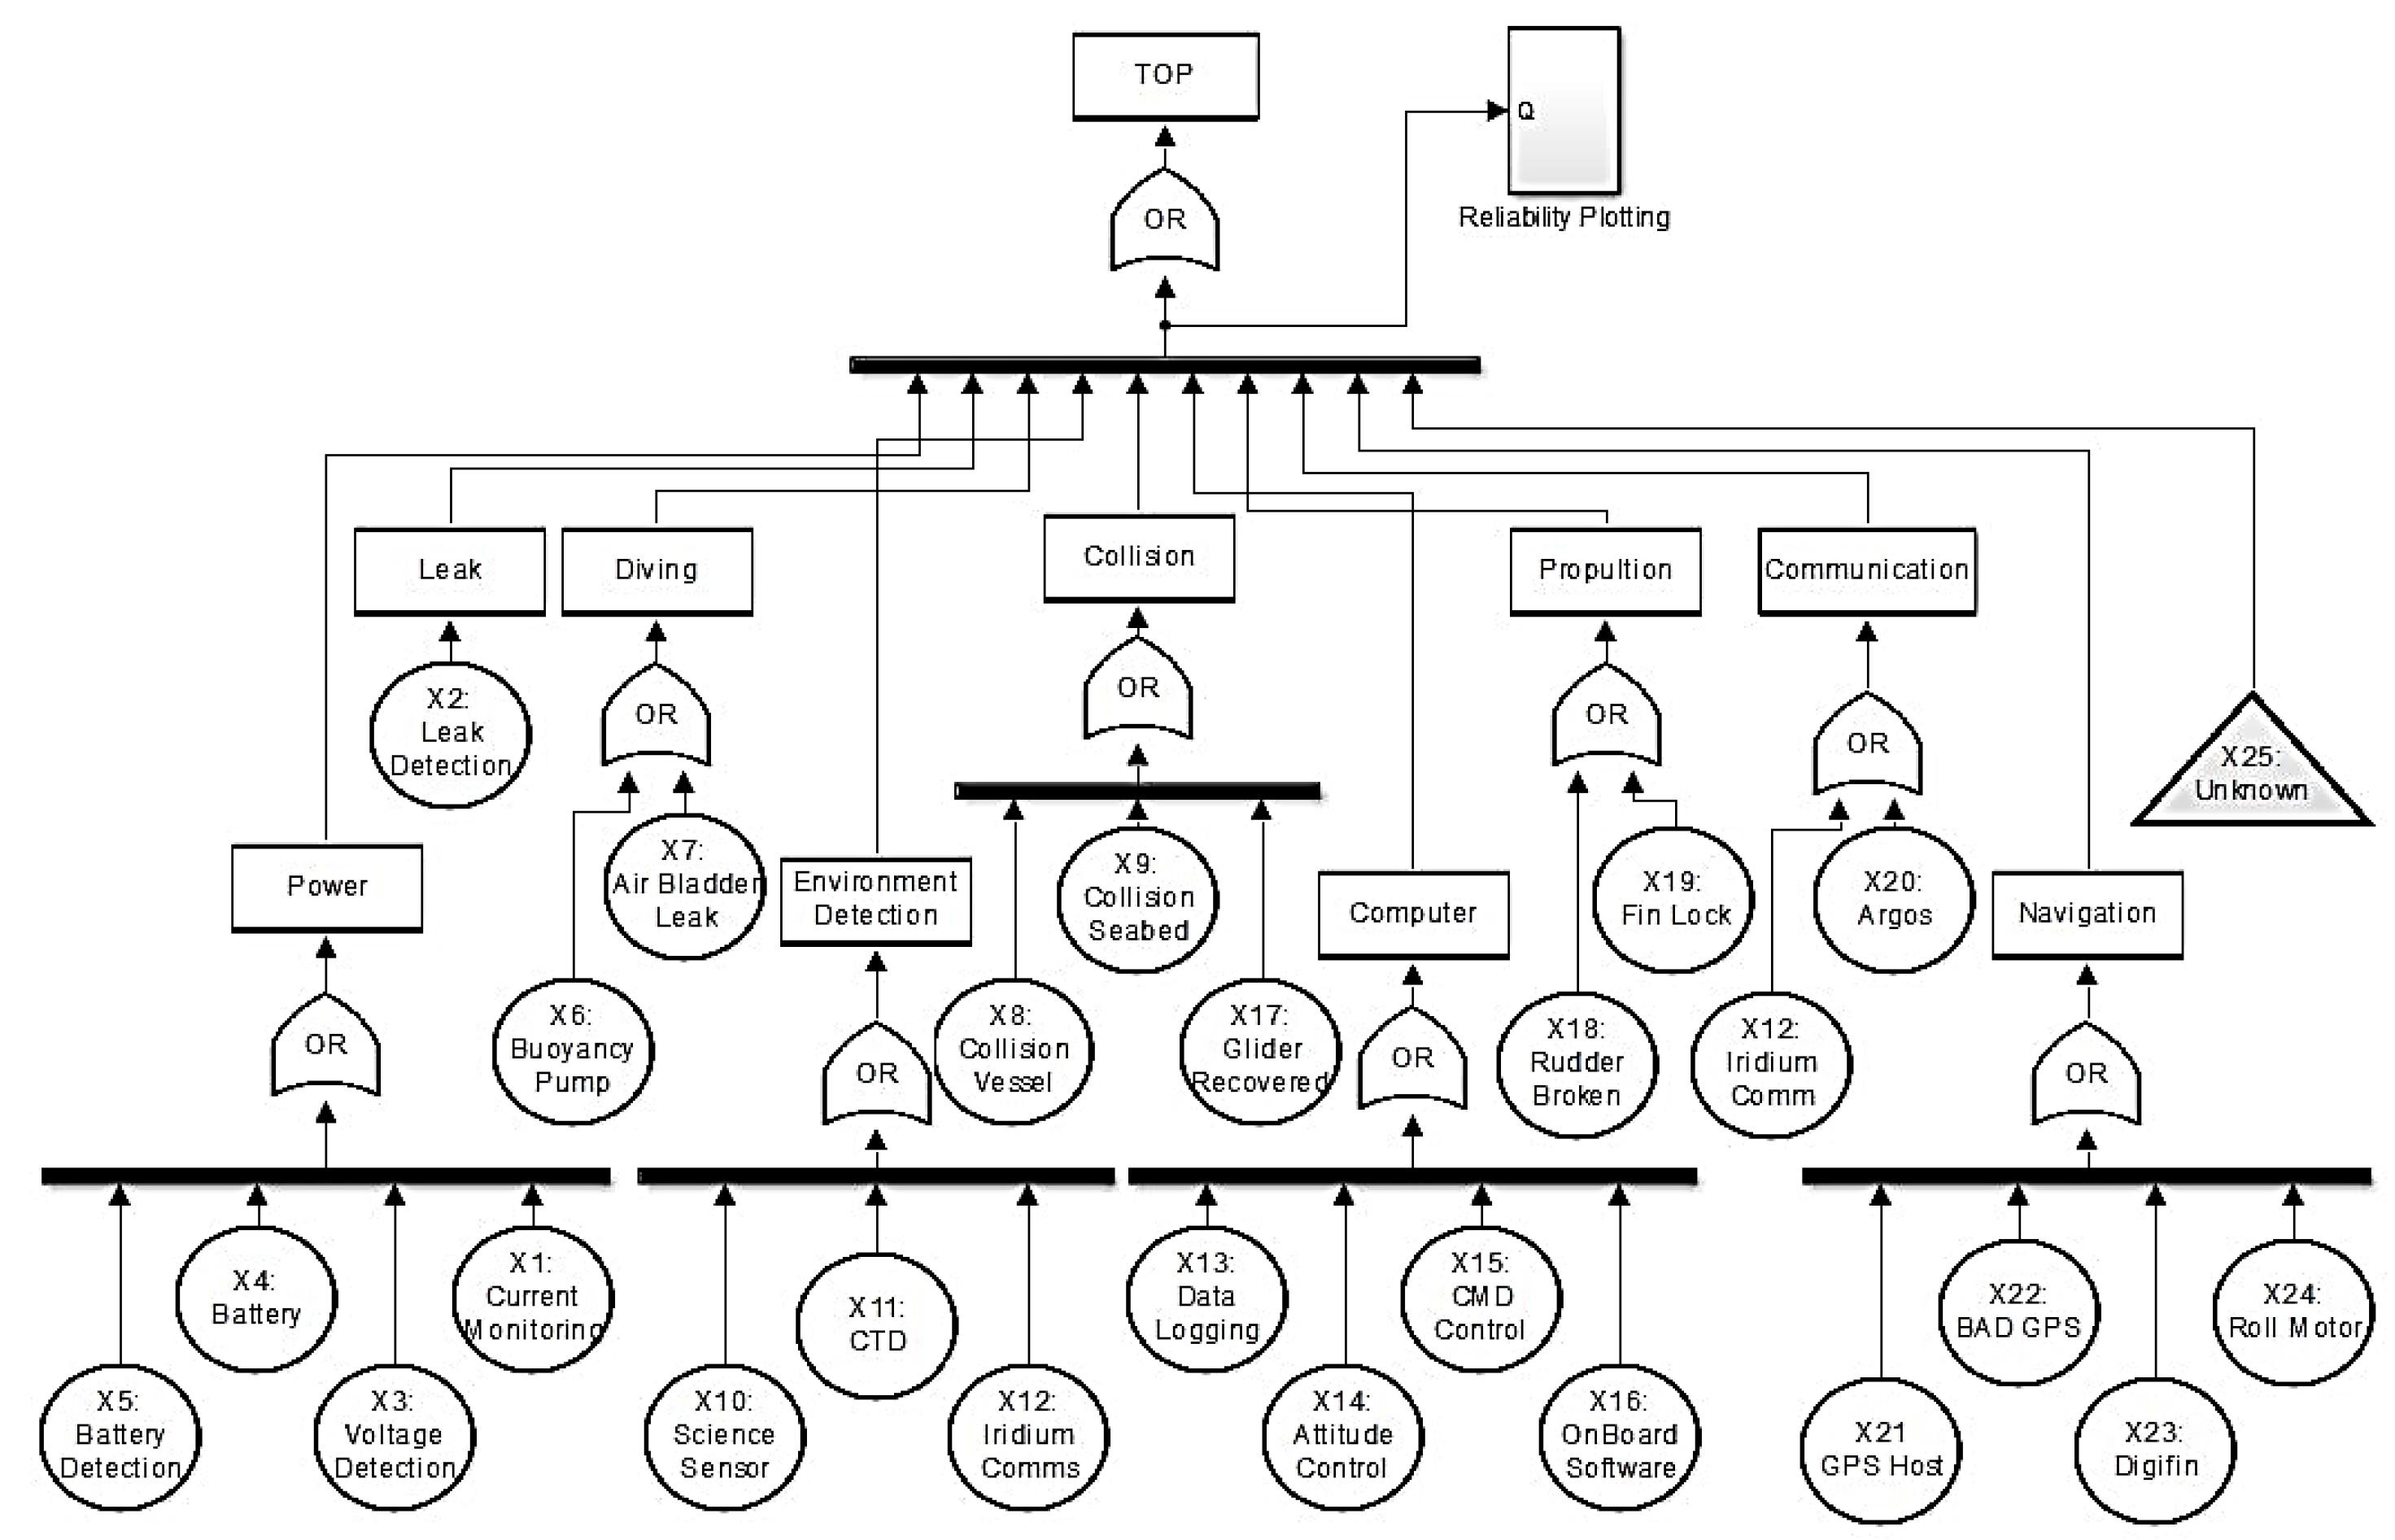 fault tree of autonomous underwater gliding robot - file exchange